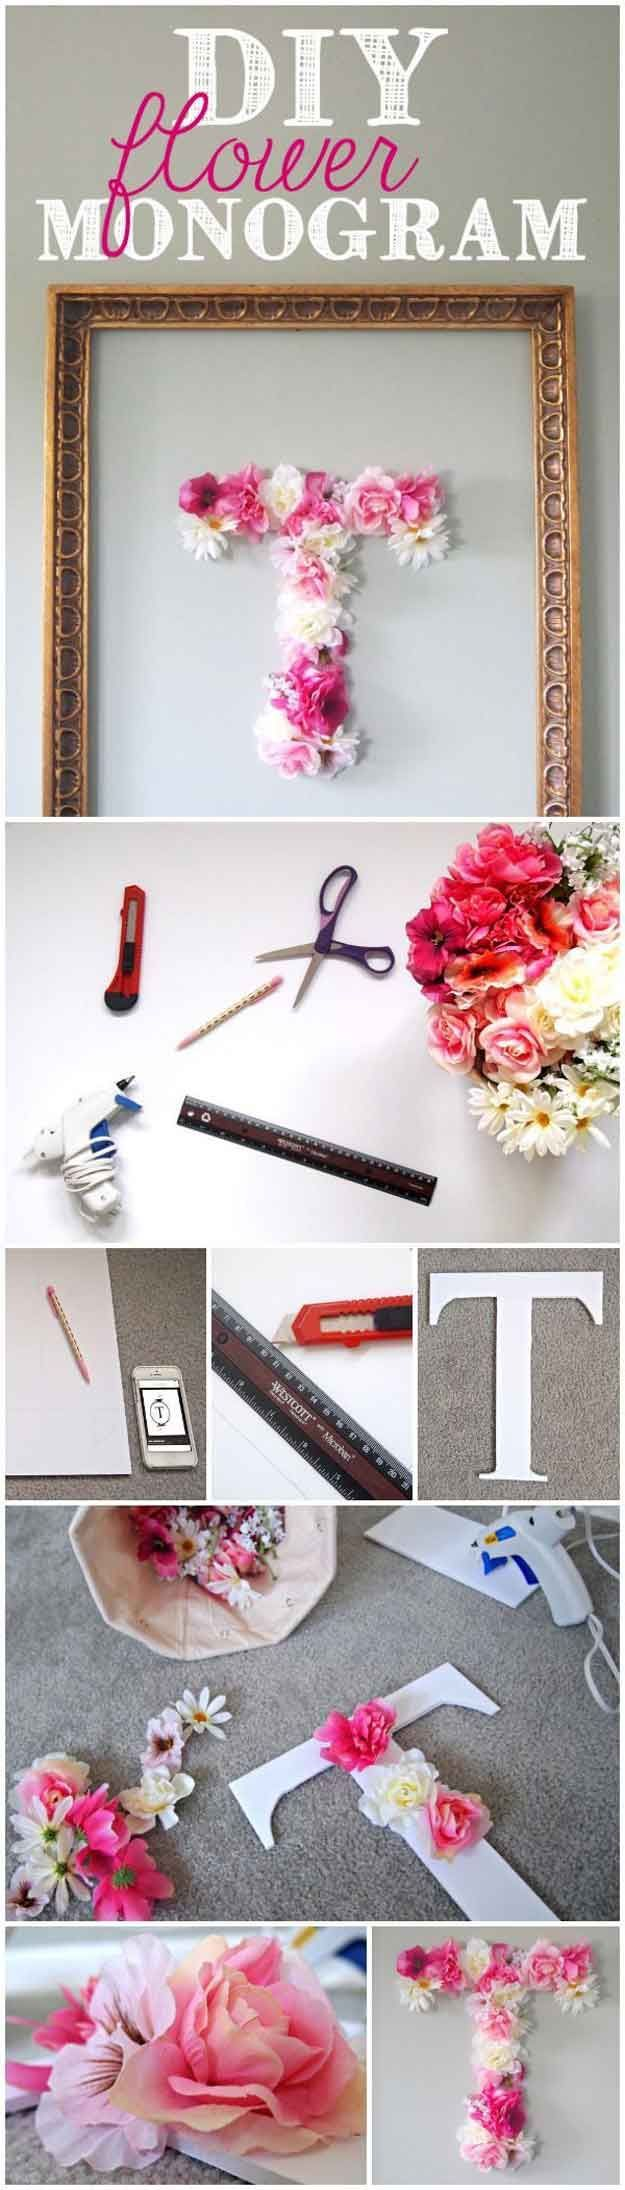 Home Decor Inspiration Diy Projects For Teens Bedroom Diyready Com